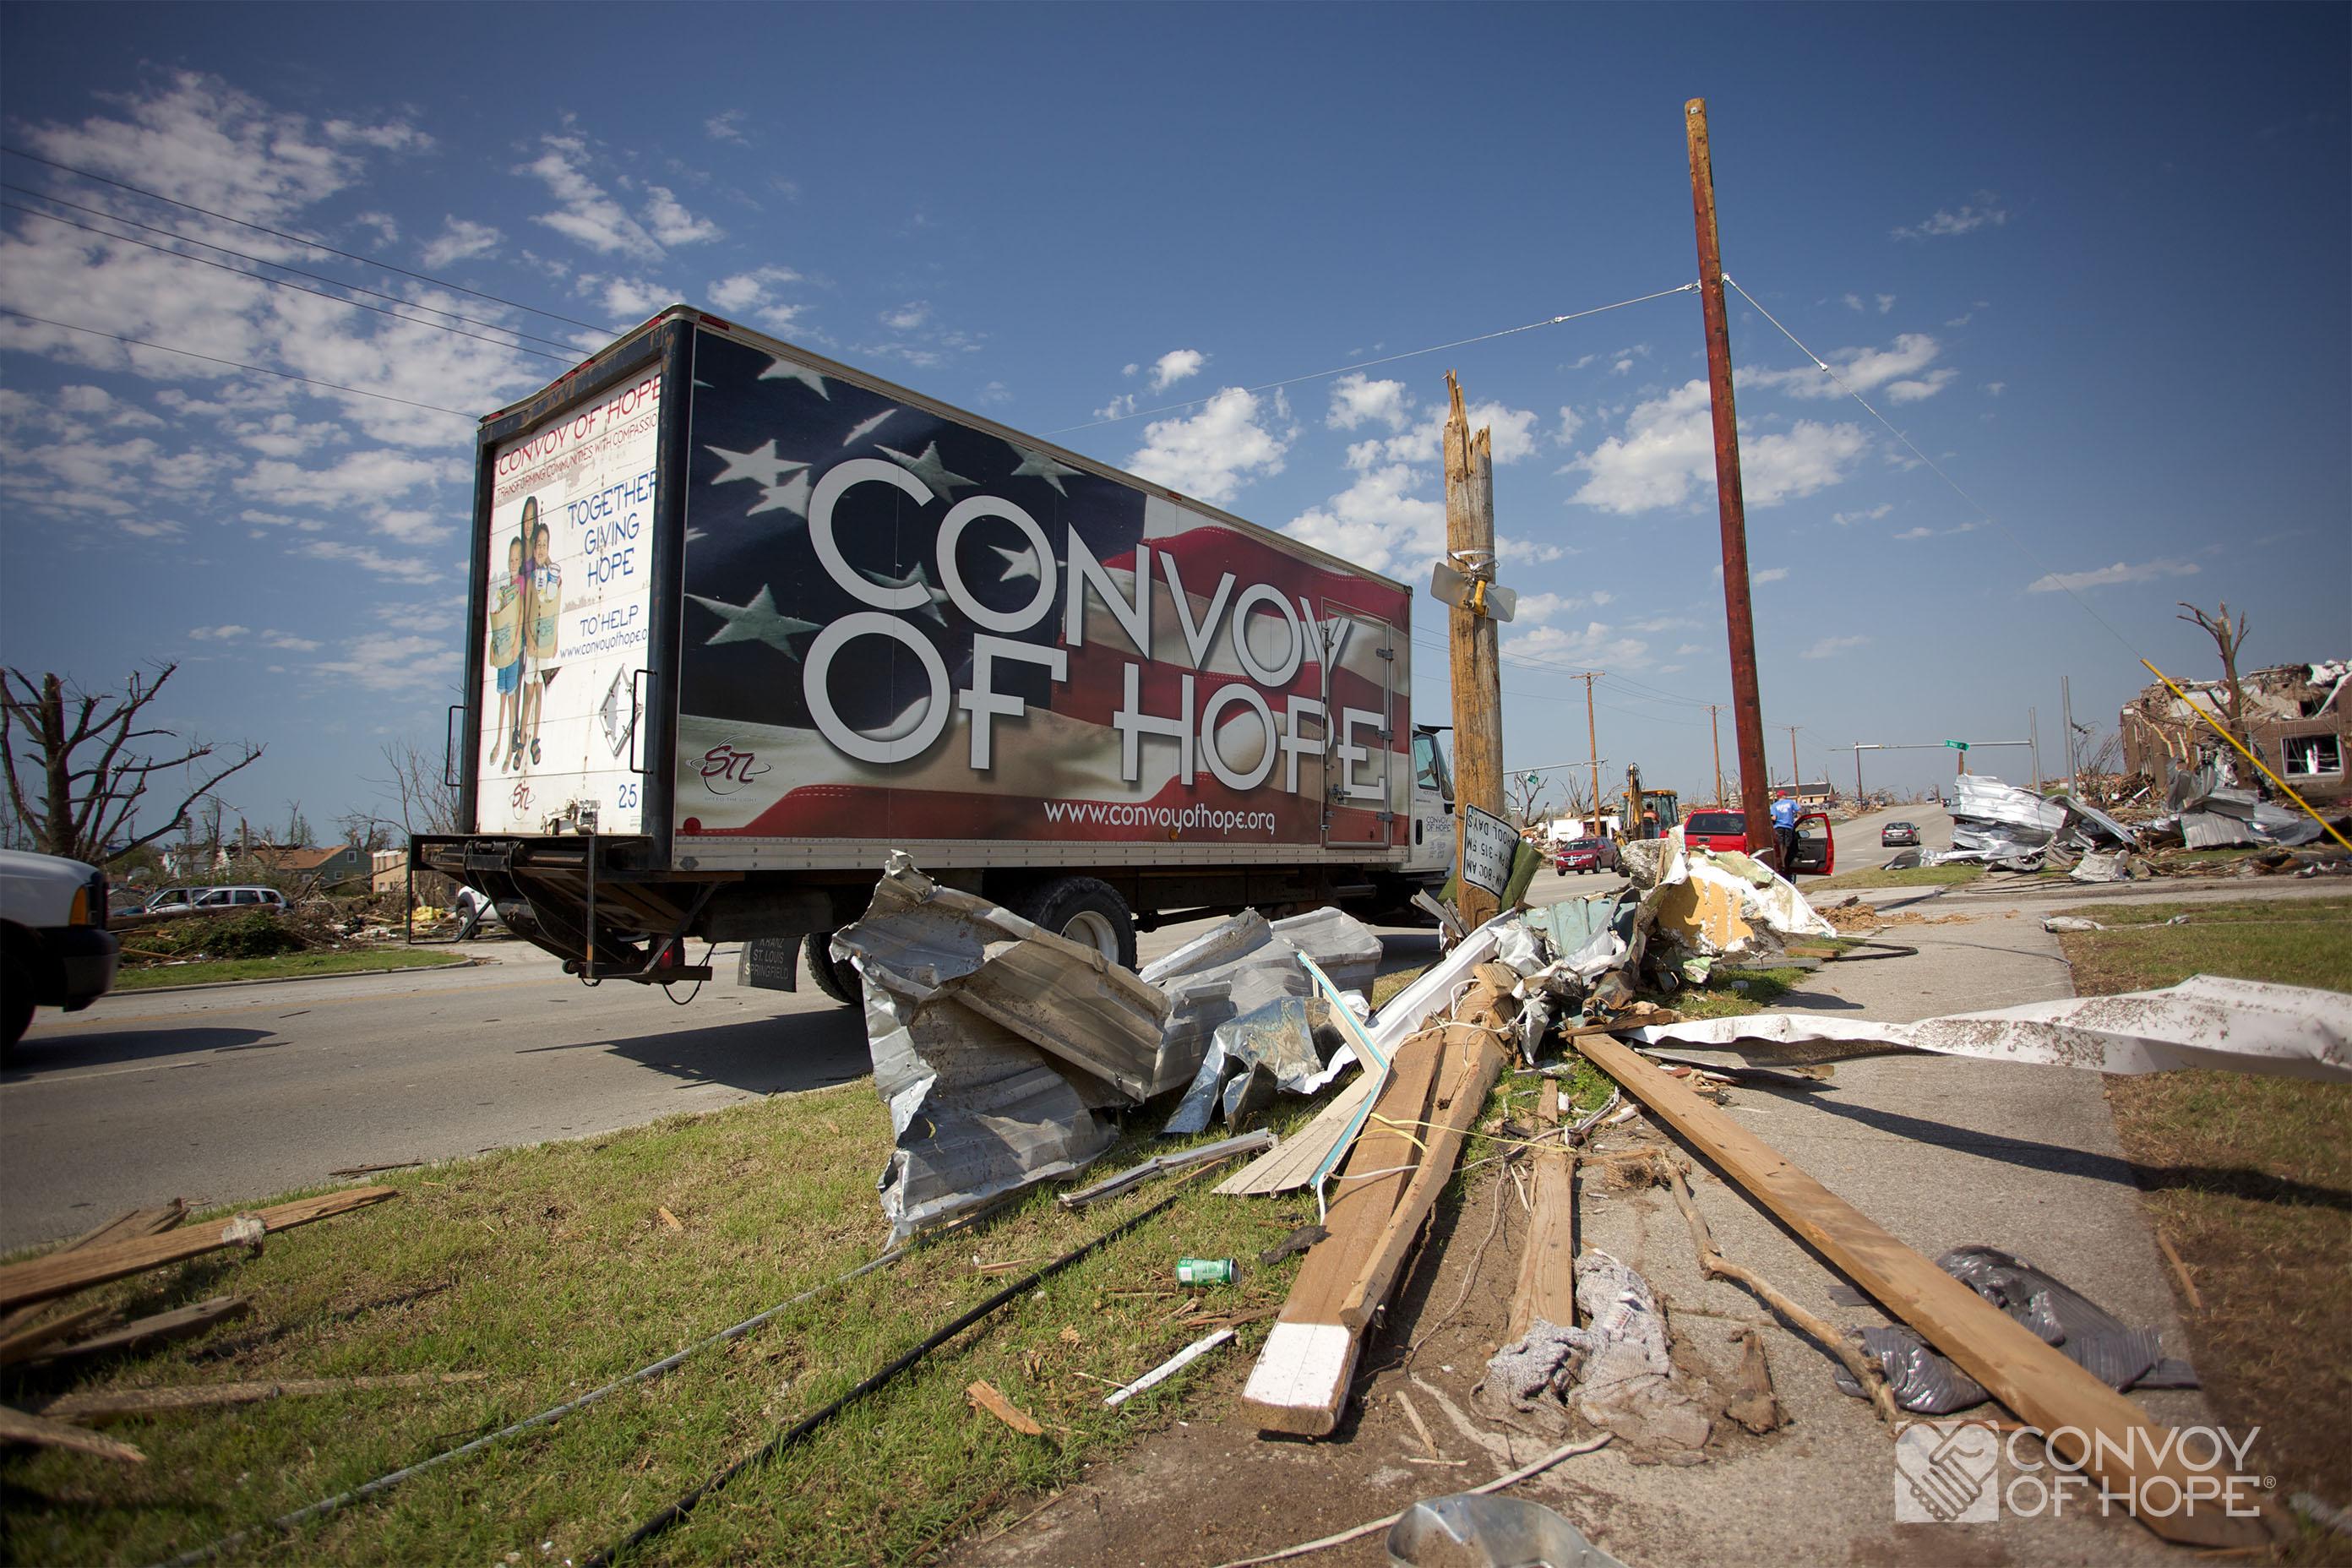 Convoy of Hope Truck Effort – Convoy of Hope